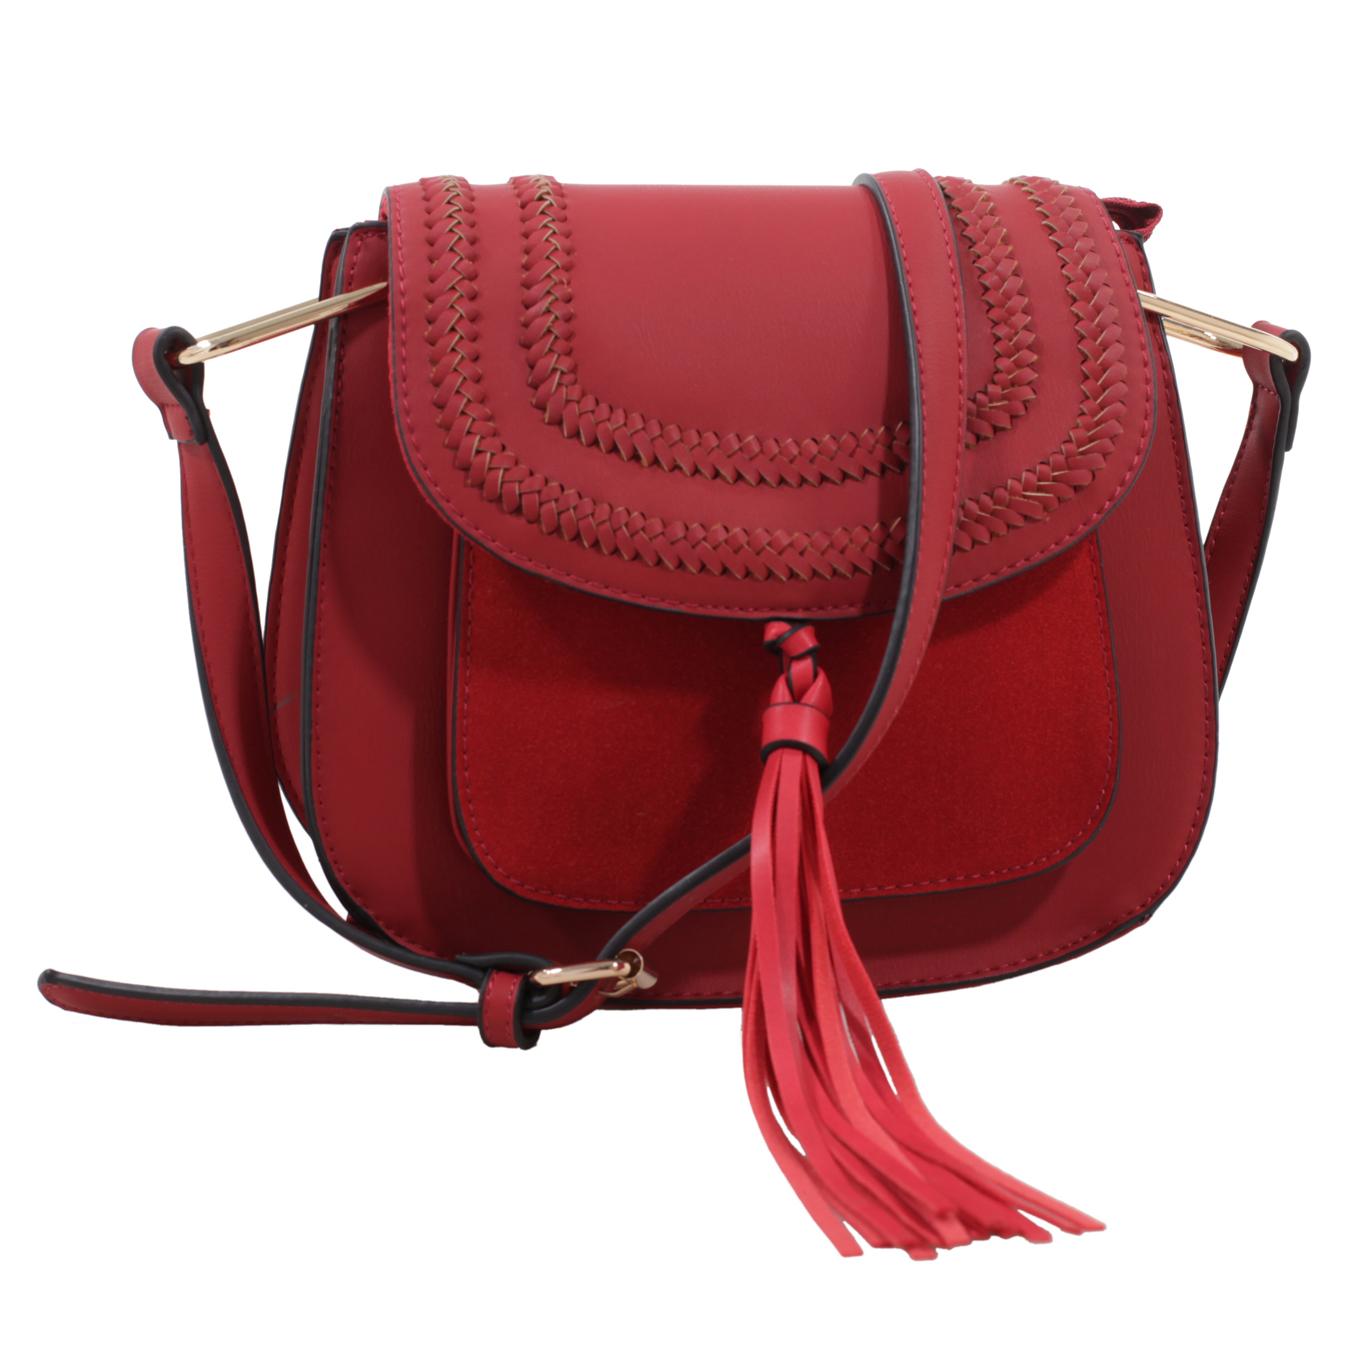 MKF Collection Riga Celebrity Style Saddle Bag